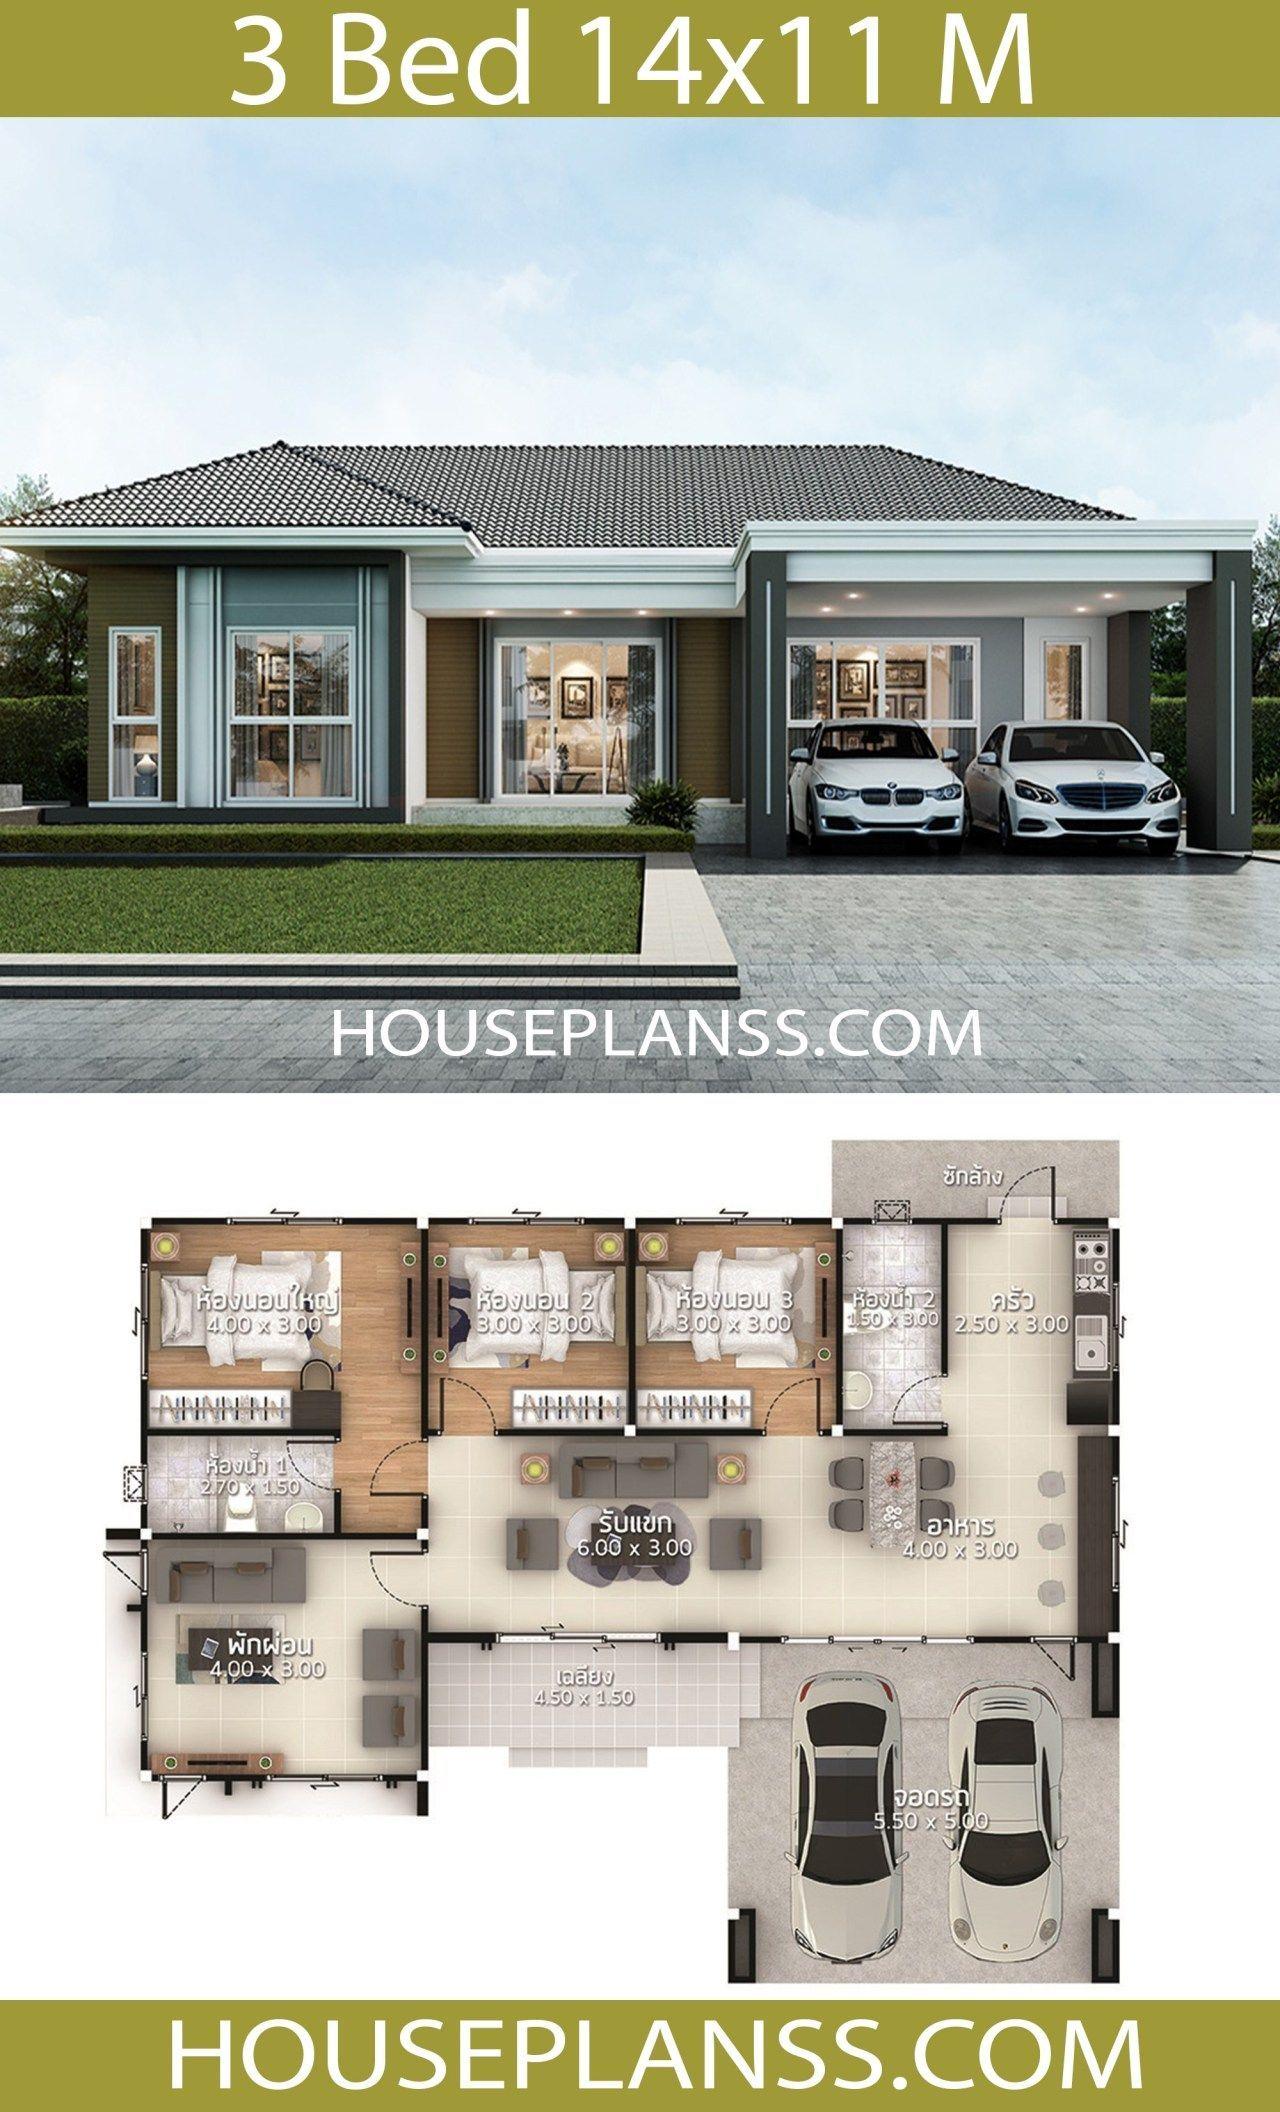 House Design Plans Idea 14x11 With 3 Bedrooms Home Ideas House Design Plans Idea 14 11 With 3 Bedrooms Kucuk Ev Planlari House Blueprints Mini Ev Planlari